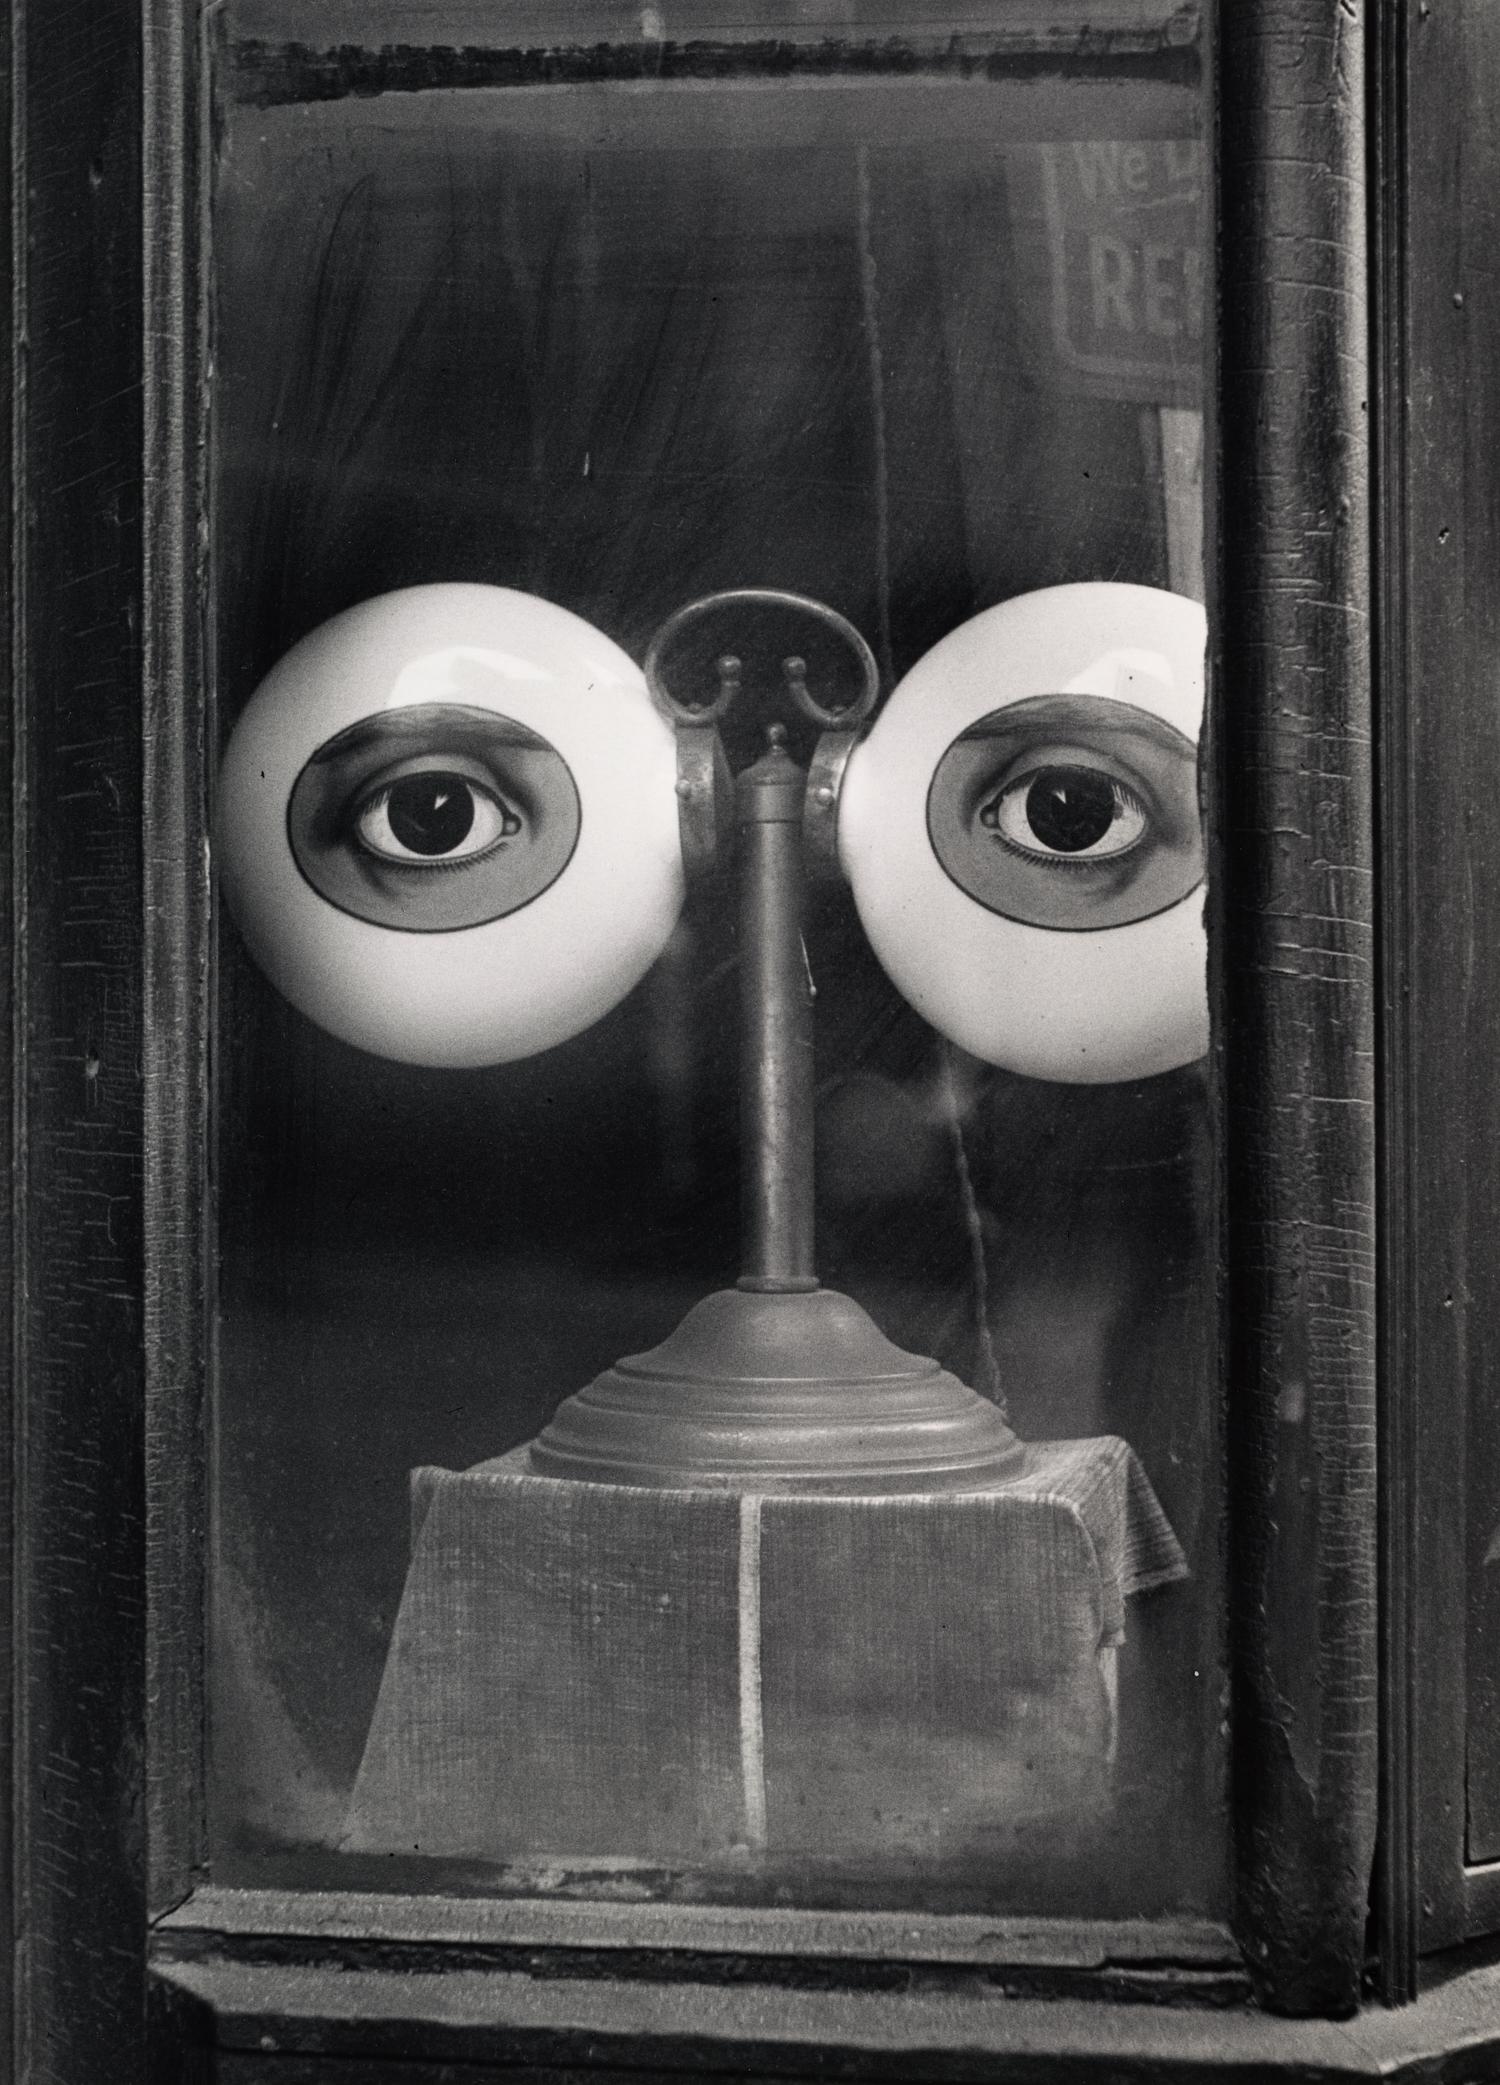 Optician's Shop Window (B) , New York, 1939 Gelatin silver print © Condé Nast